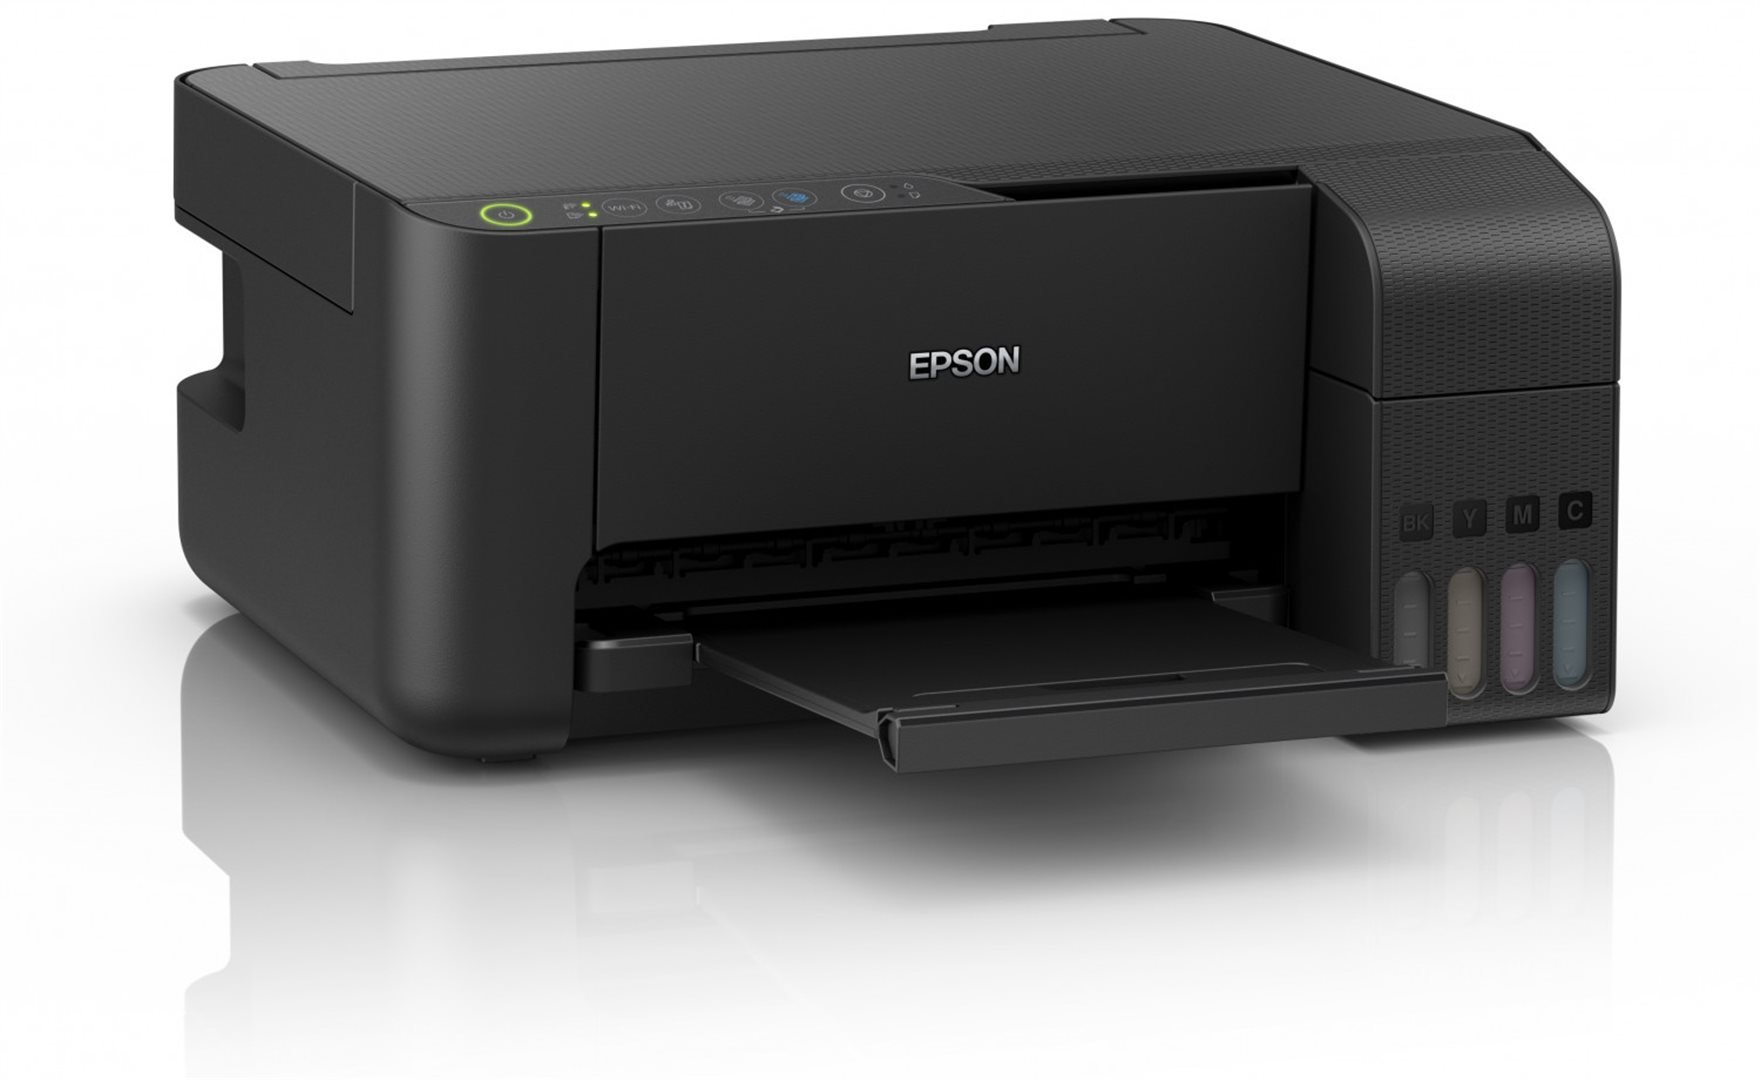 Epson EcoTank L3150 (C11CG86405)